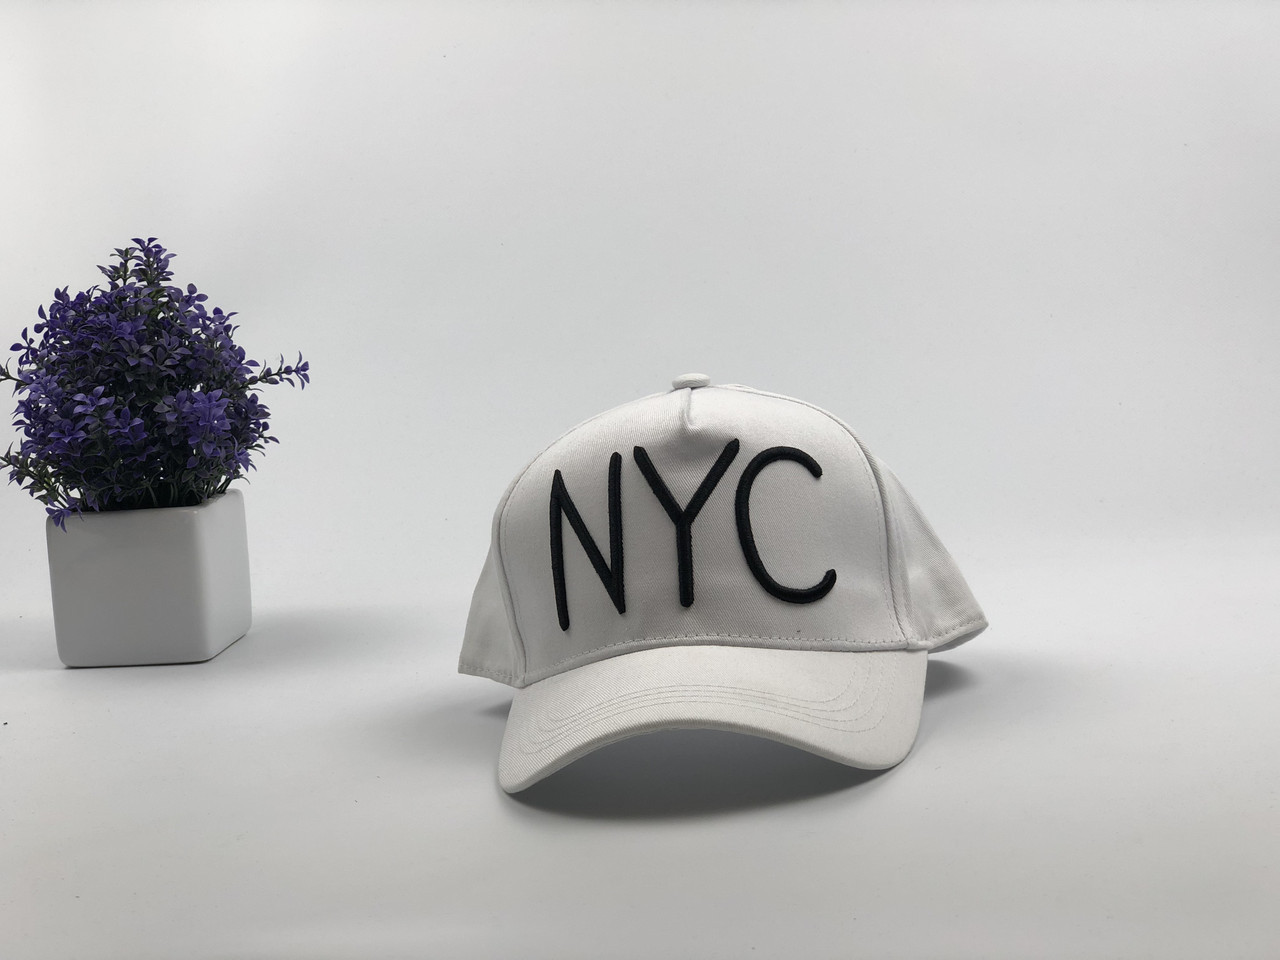 Кепка бейсболка NYC (белая)